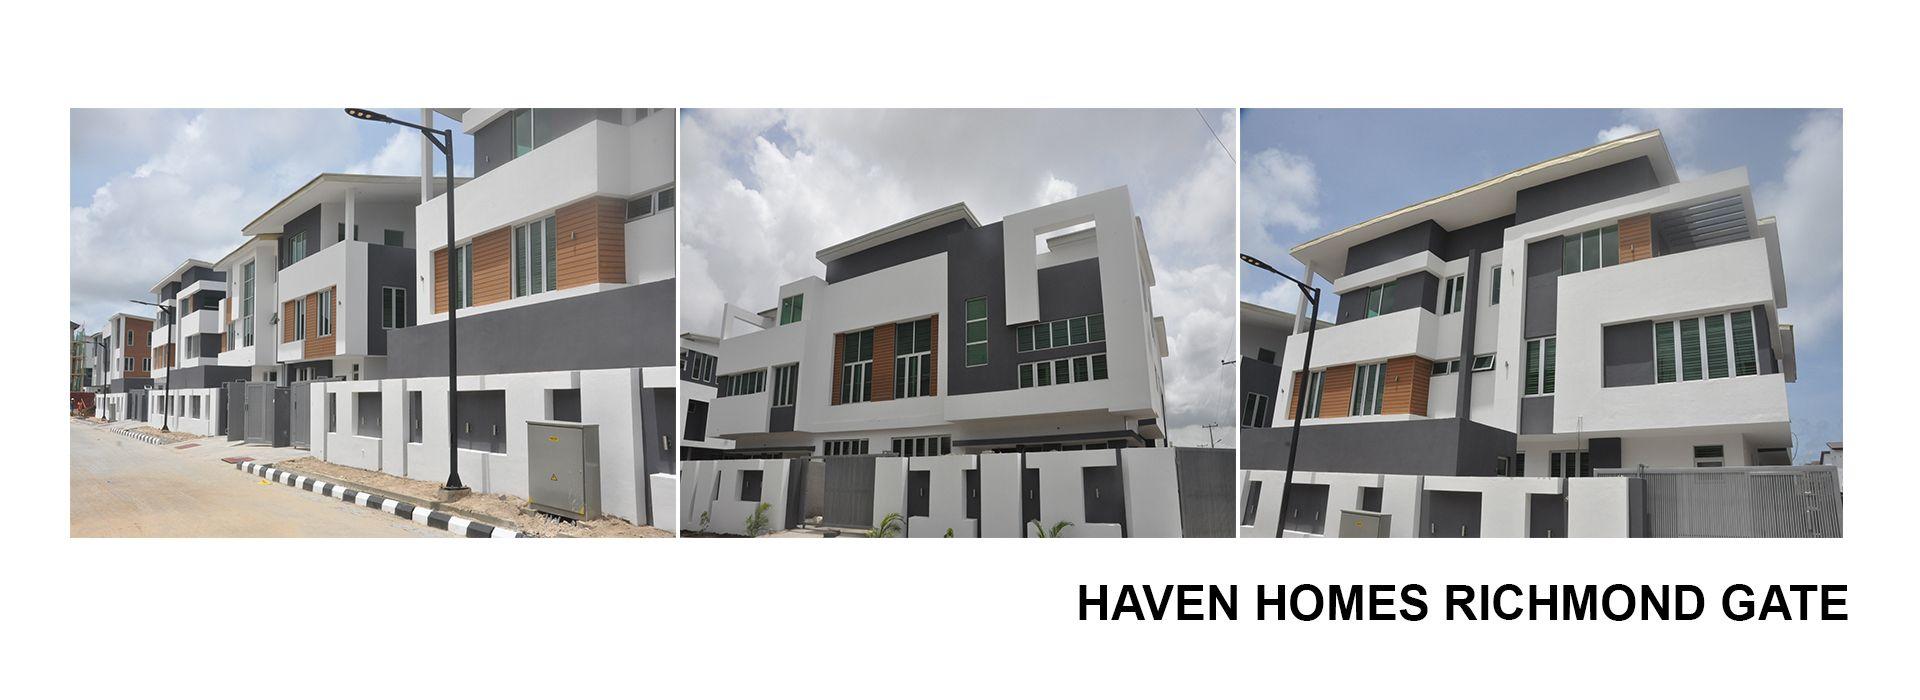 Playinarchitecture Tona Ladega Play In Architecture Lagos Nigeria In 2020 Bungalow House Design Building Design Design Build Firm